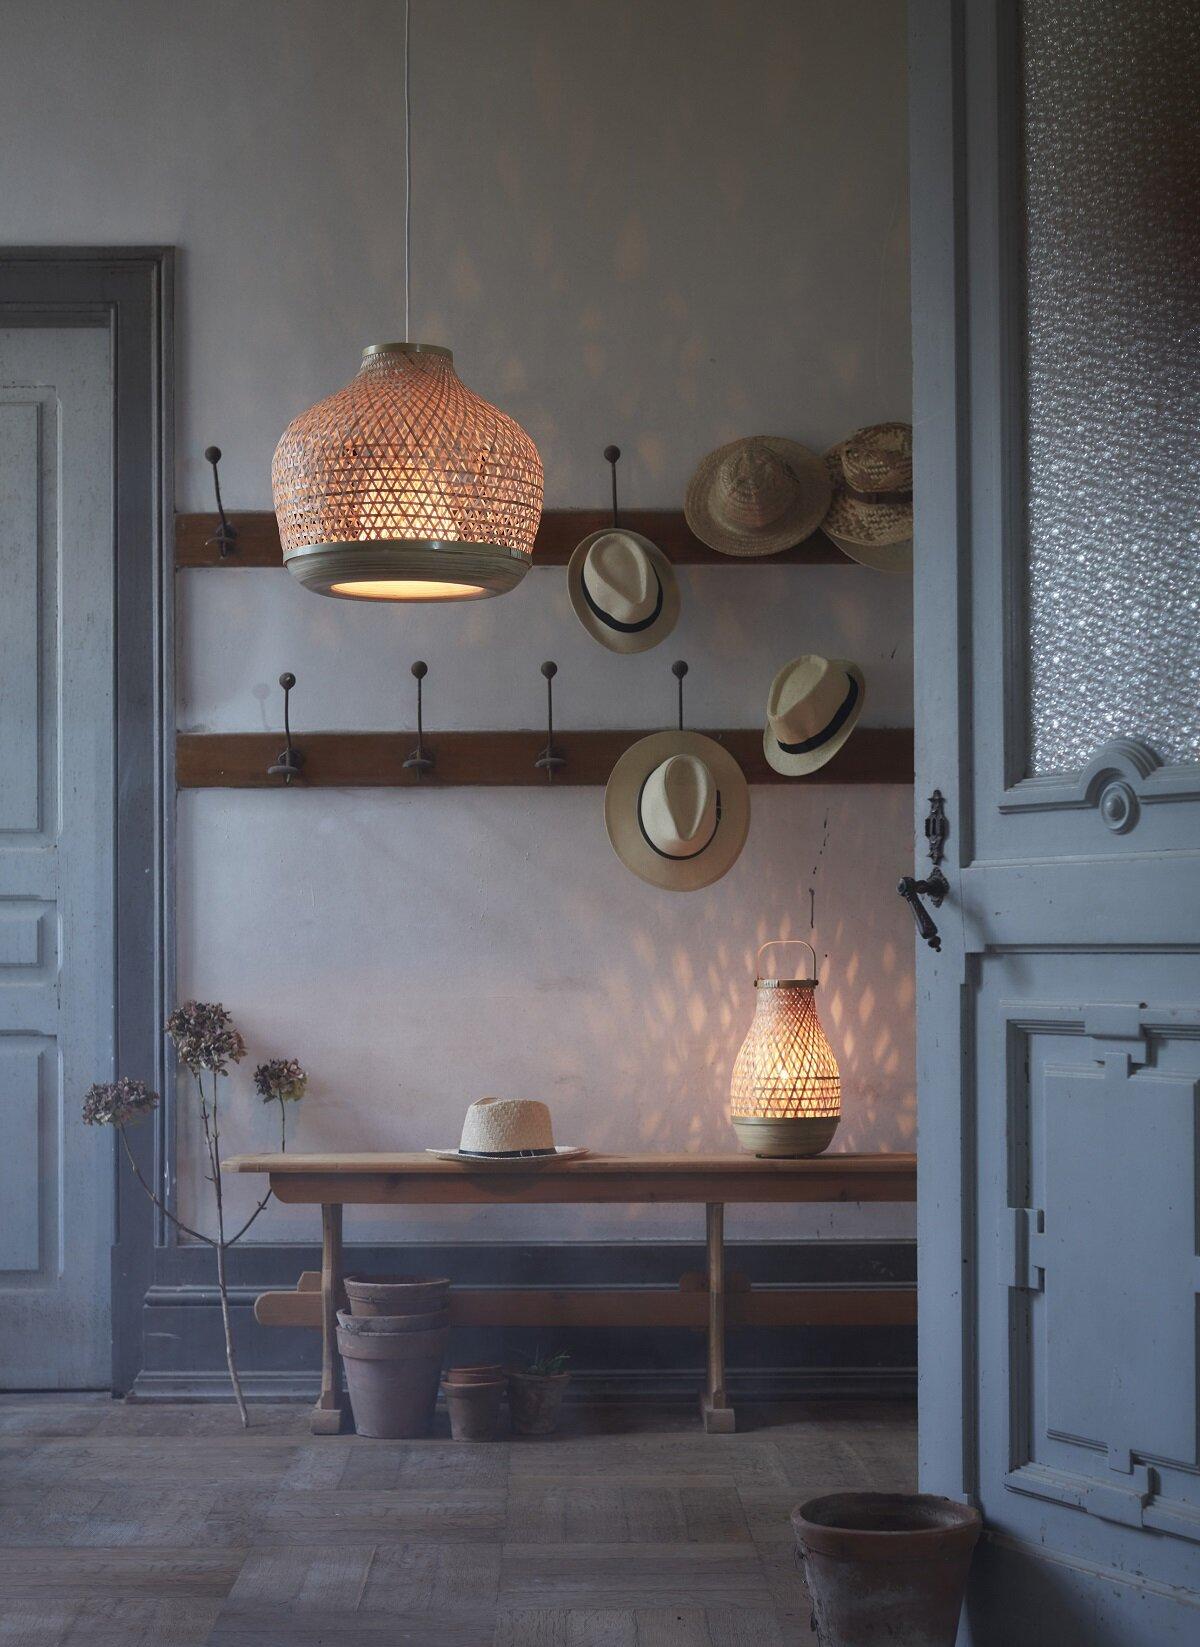 ikea news 2021 catalogue lamp misterhult 1